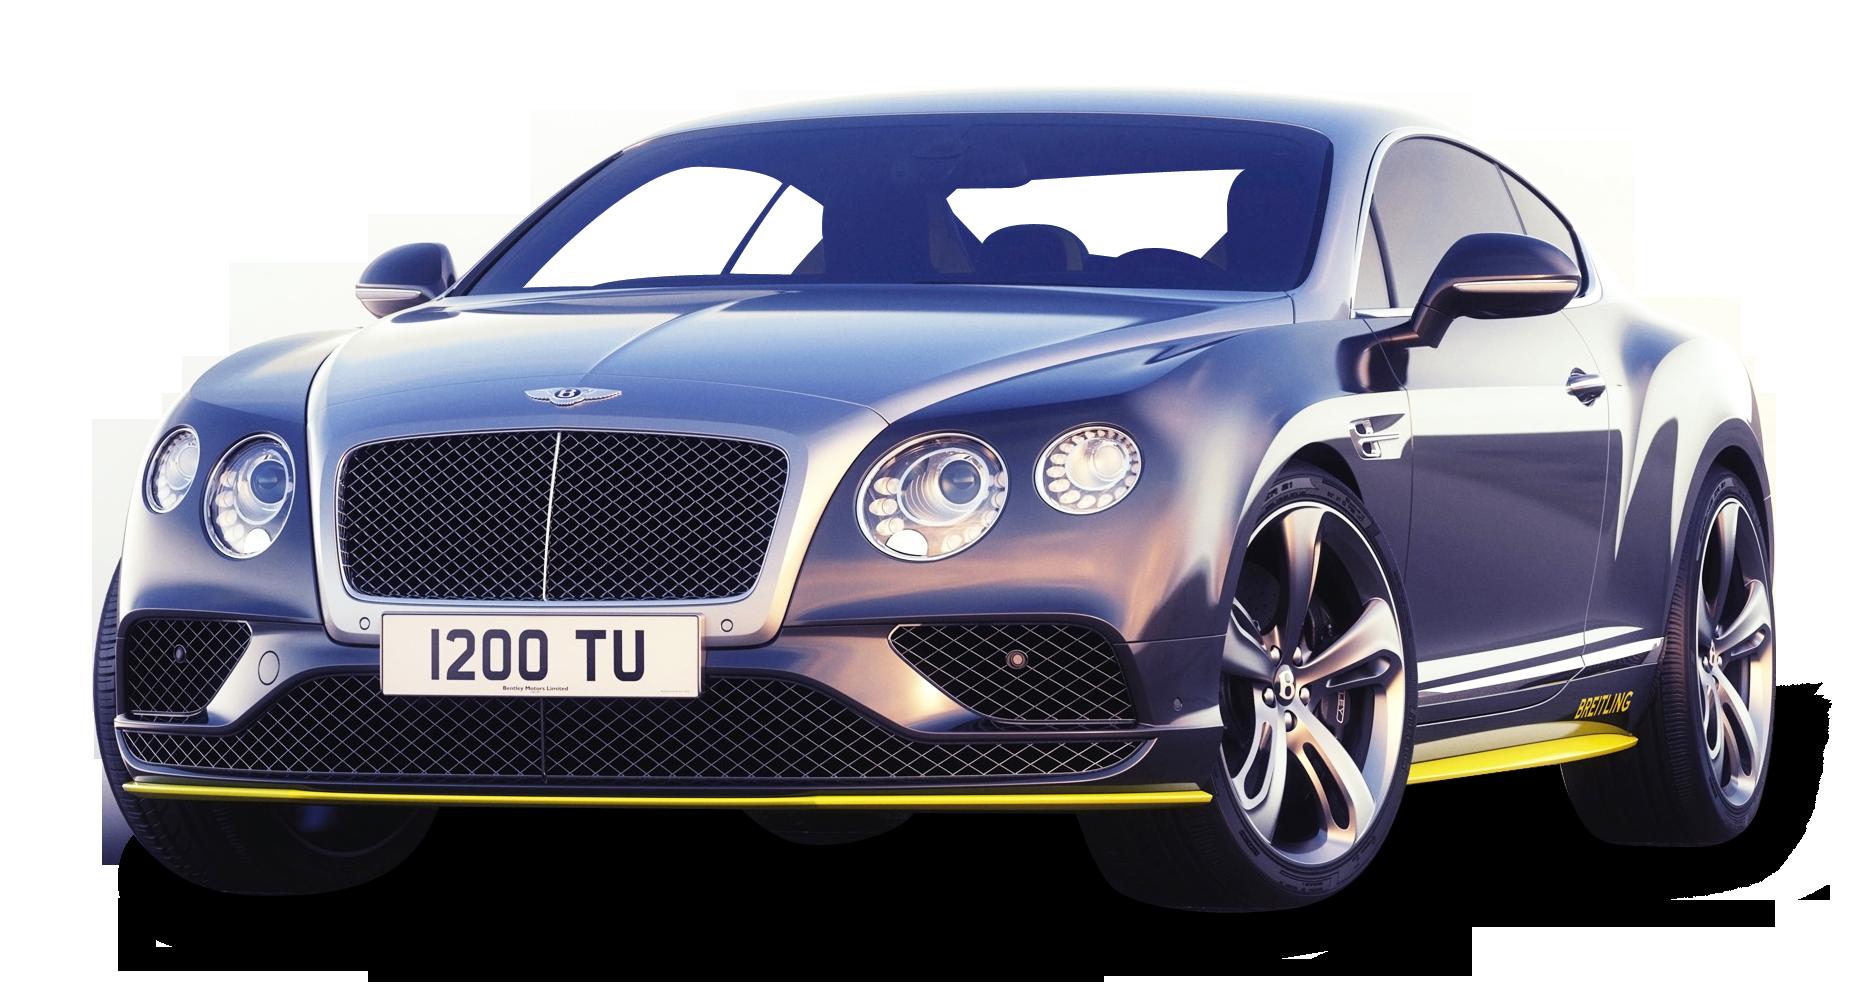 Gray Bentley Continental GT Speed Car PNG Image - Bentley PNG